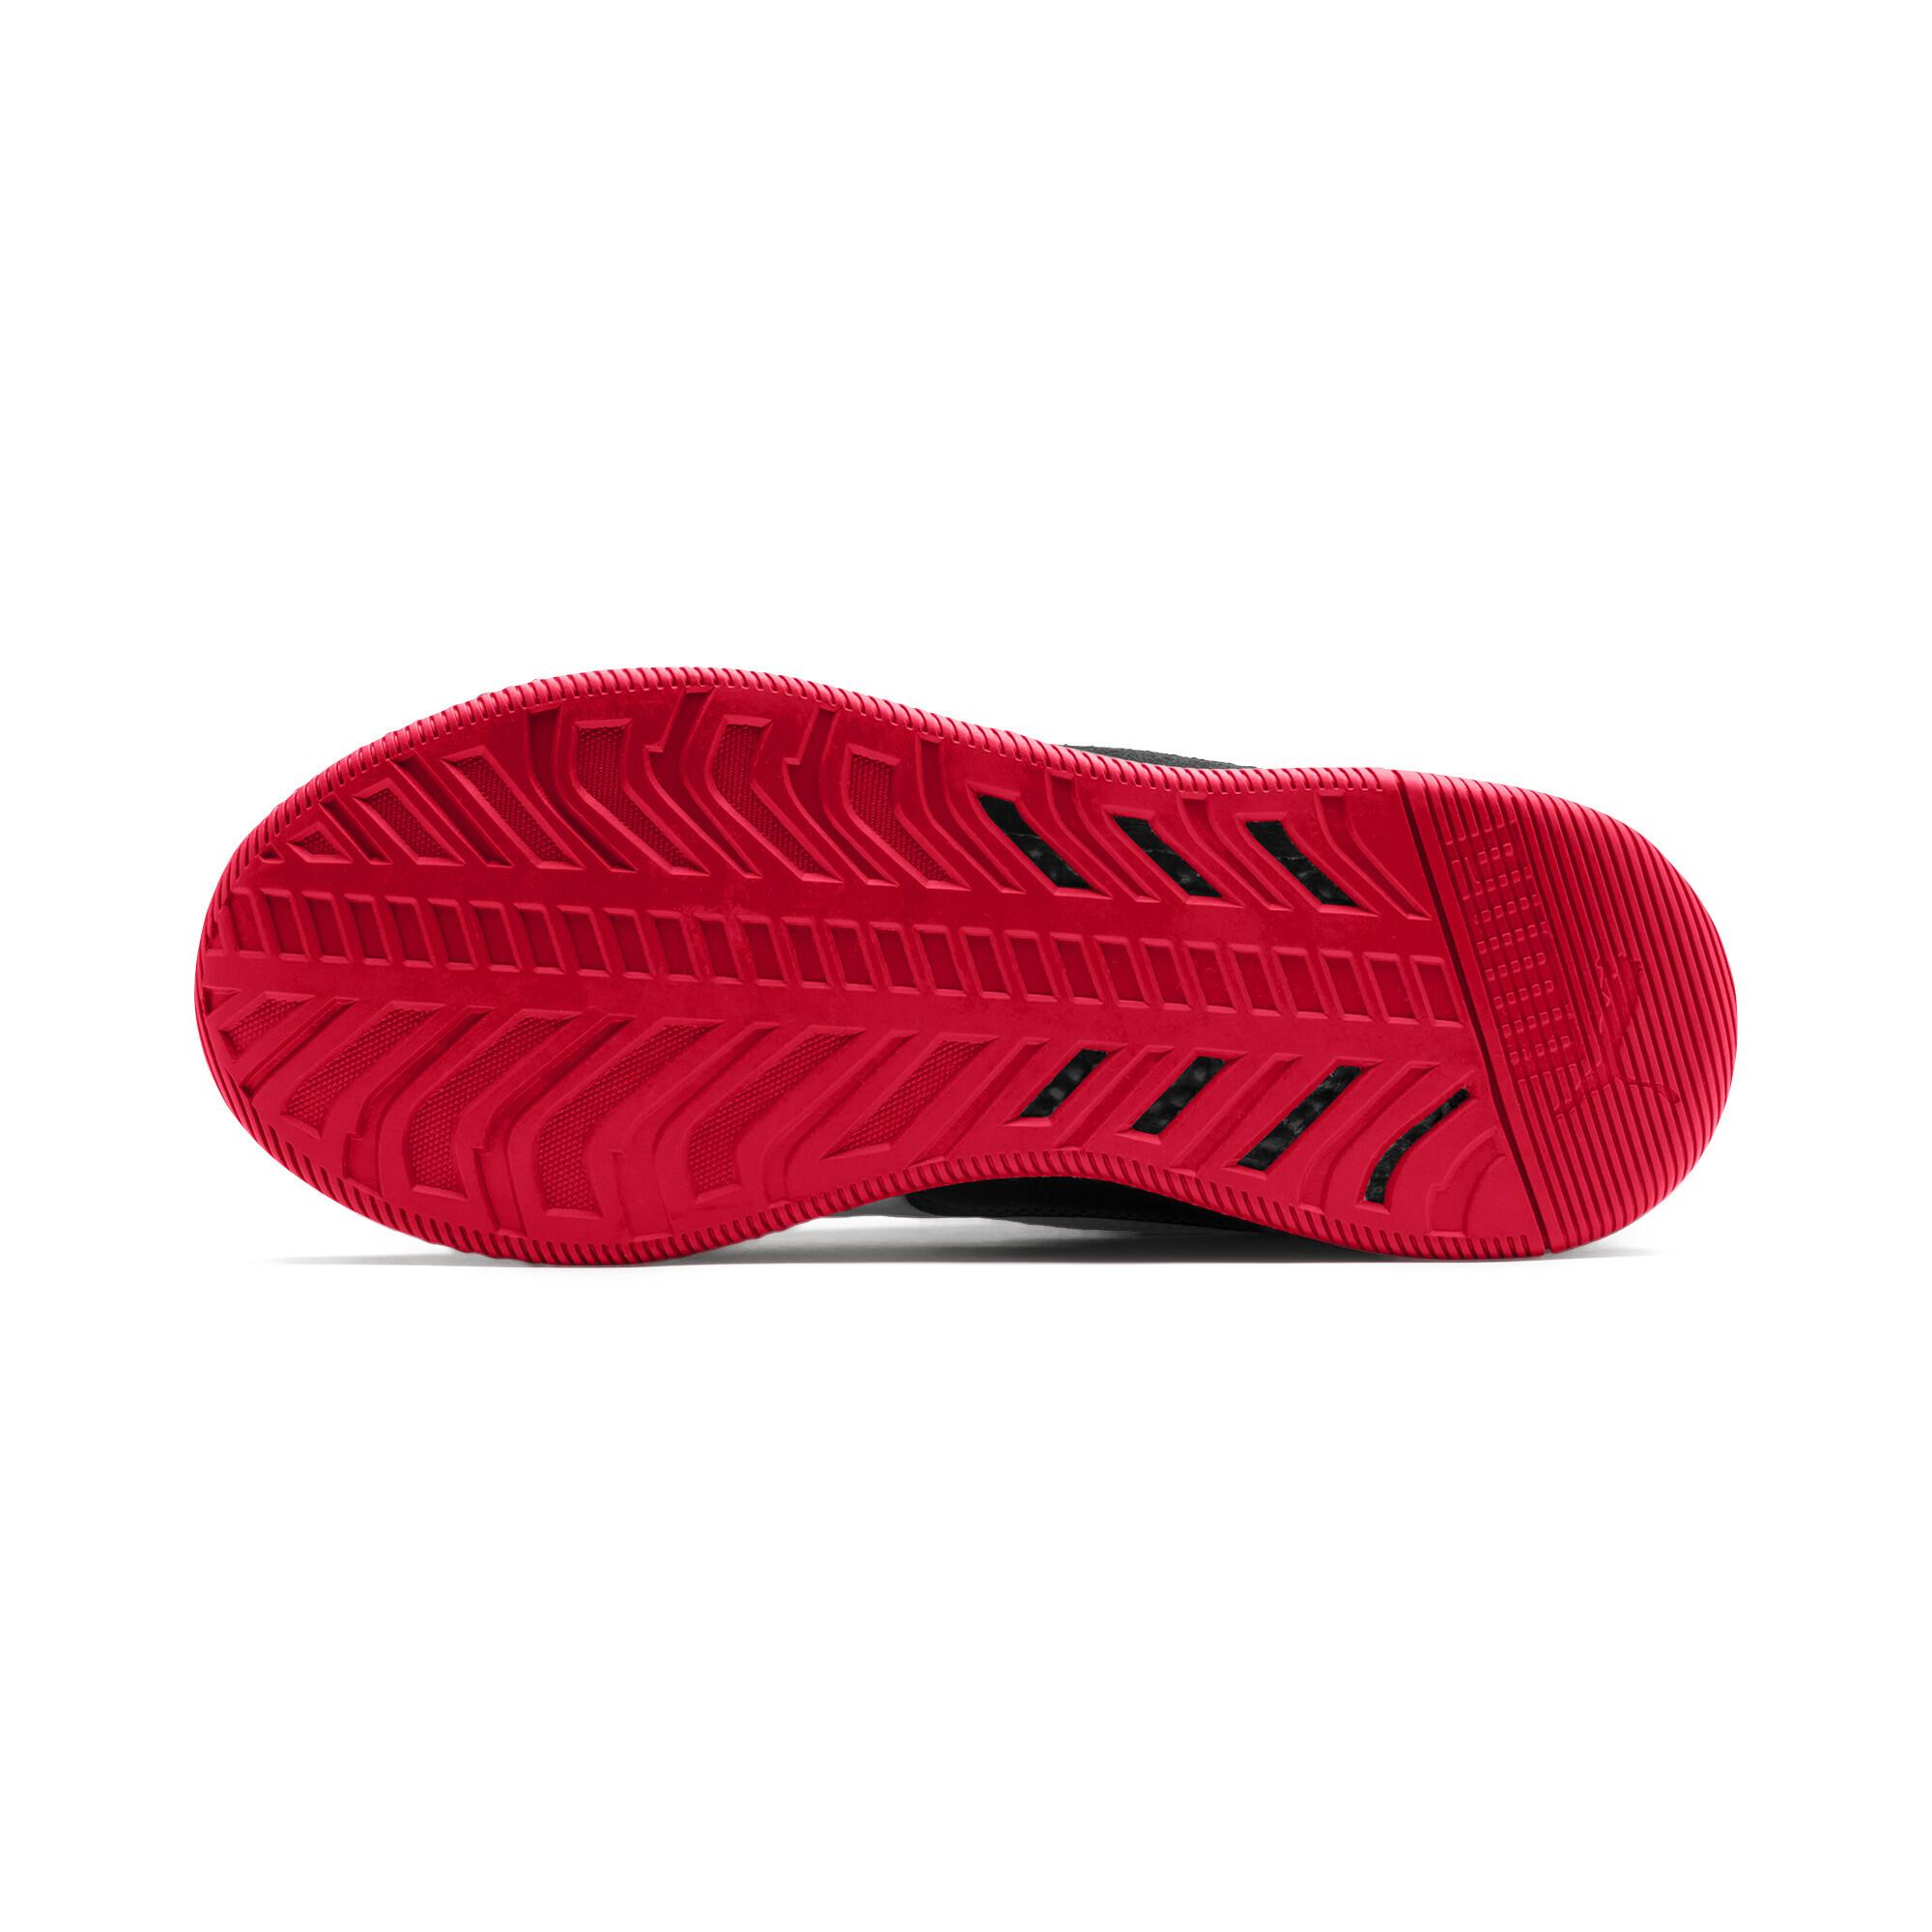 PUMA-Scuderia-Ferrari-Speed-Hybrid-LS-Men-Shoe-Auto thumbnail 6